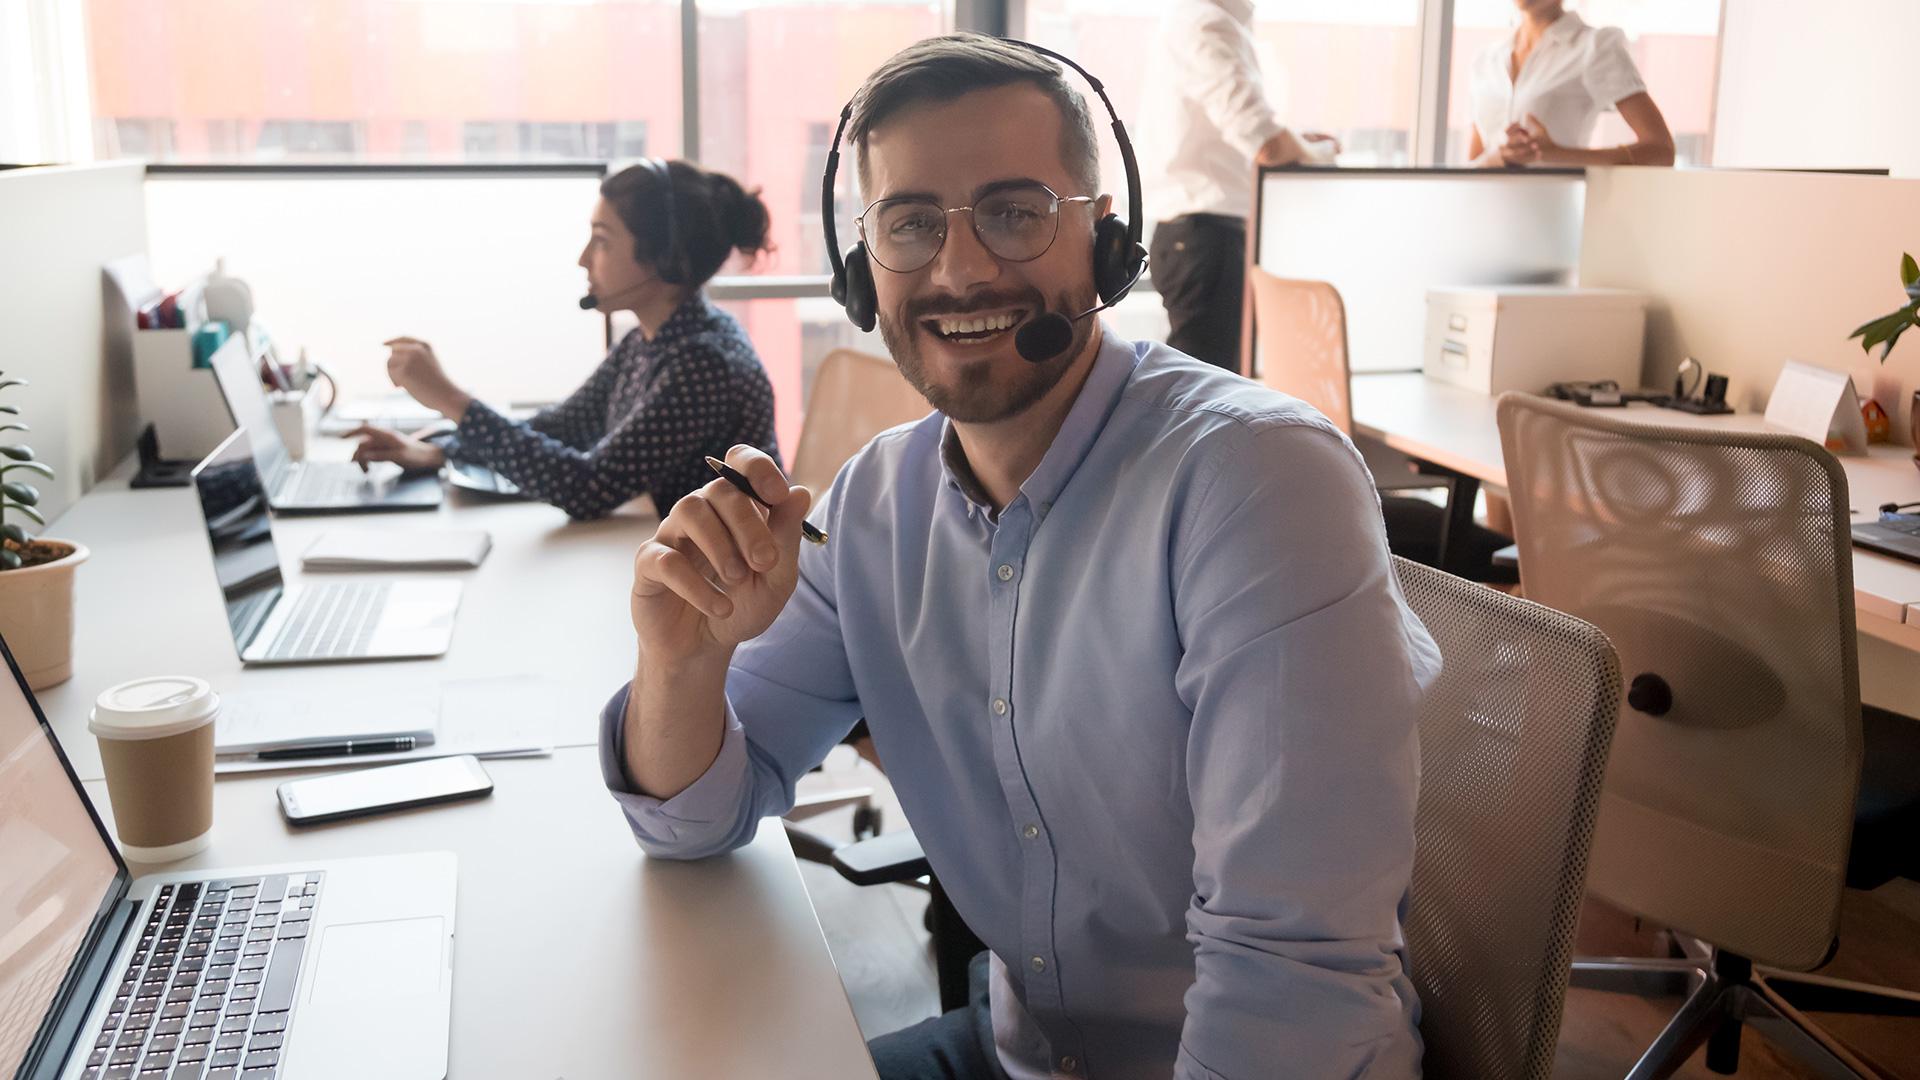 Klantcontact-medewerker-glimlachend-aan-bureau